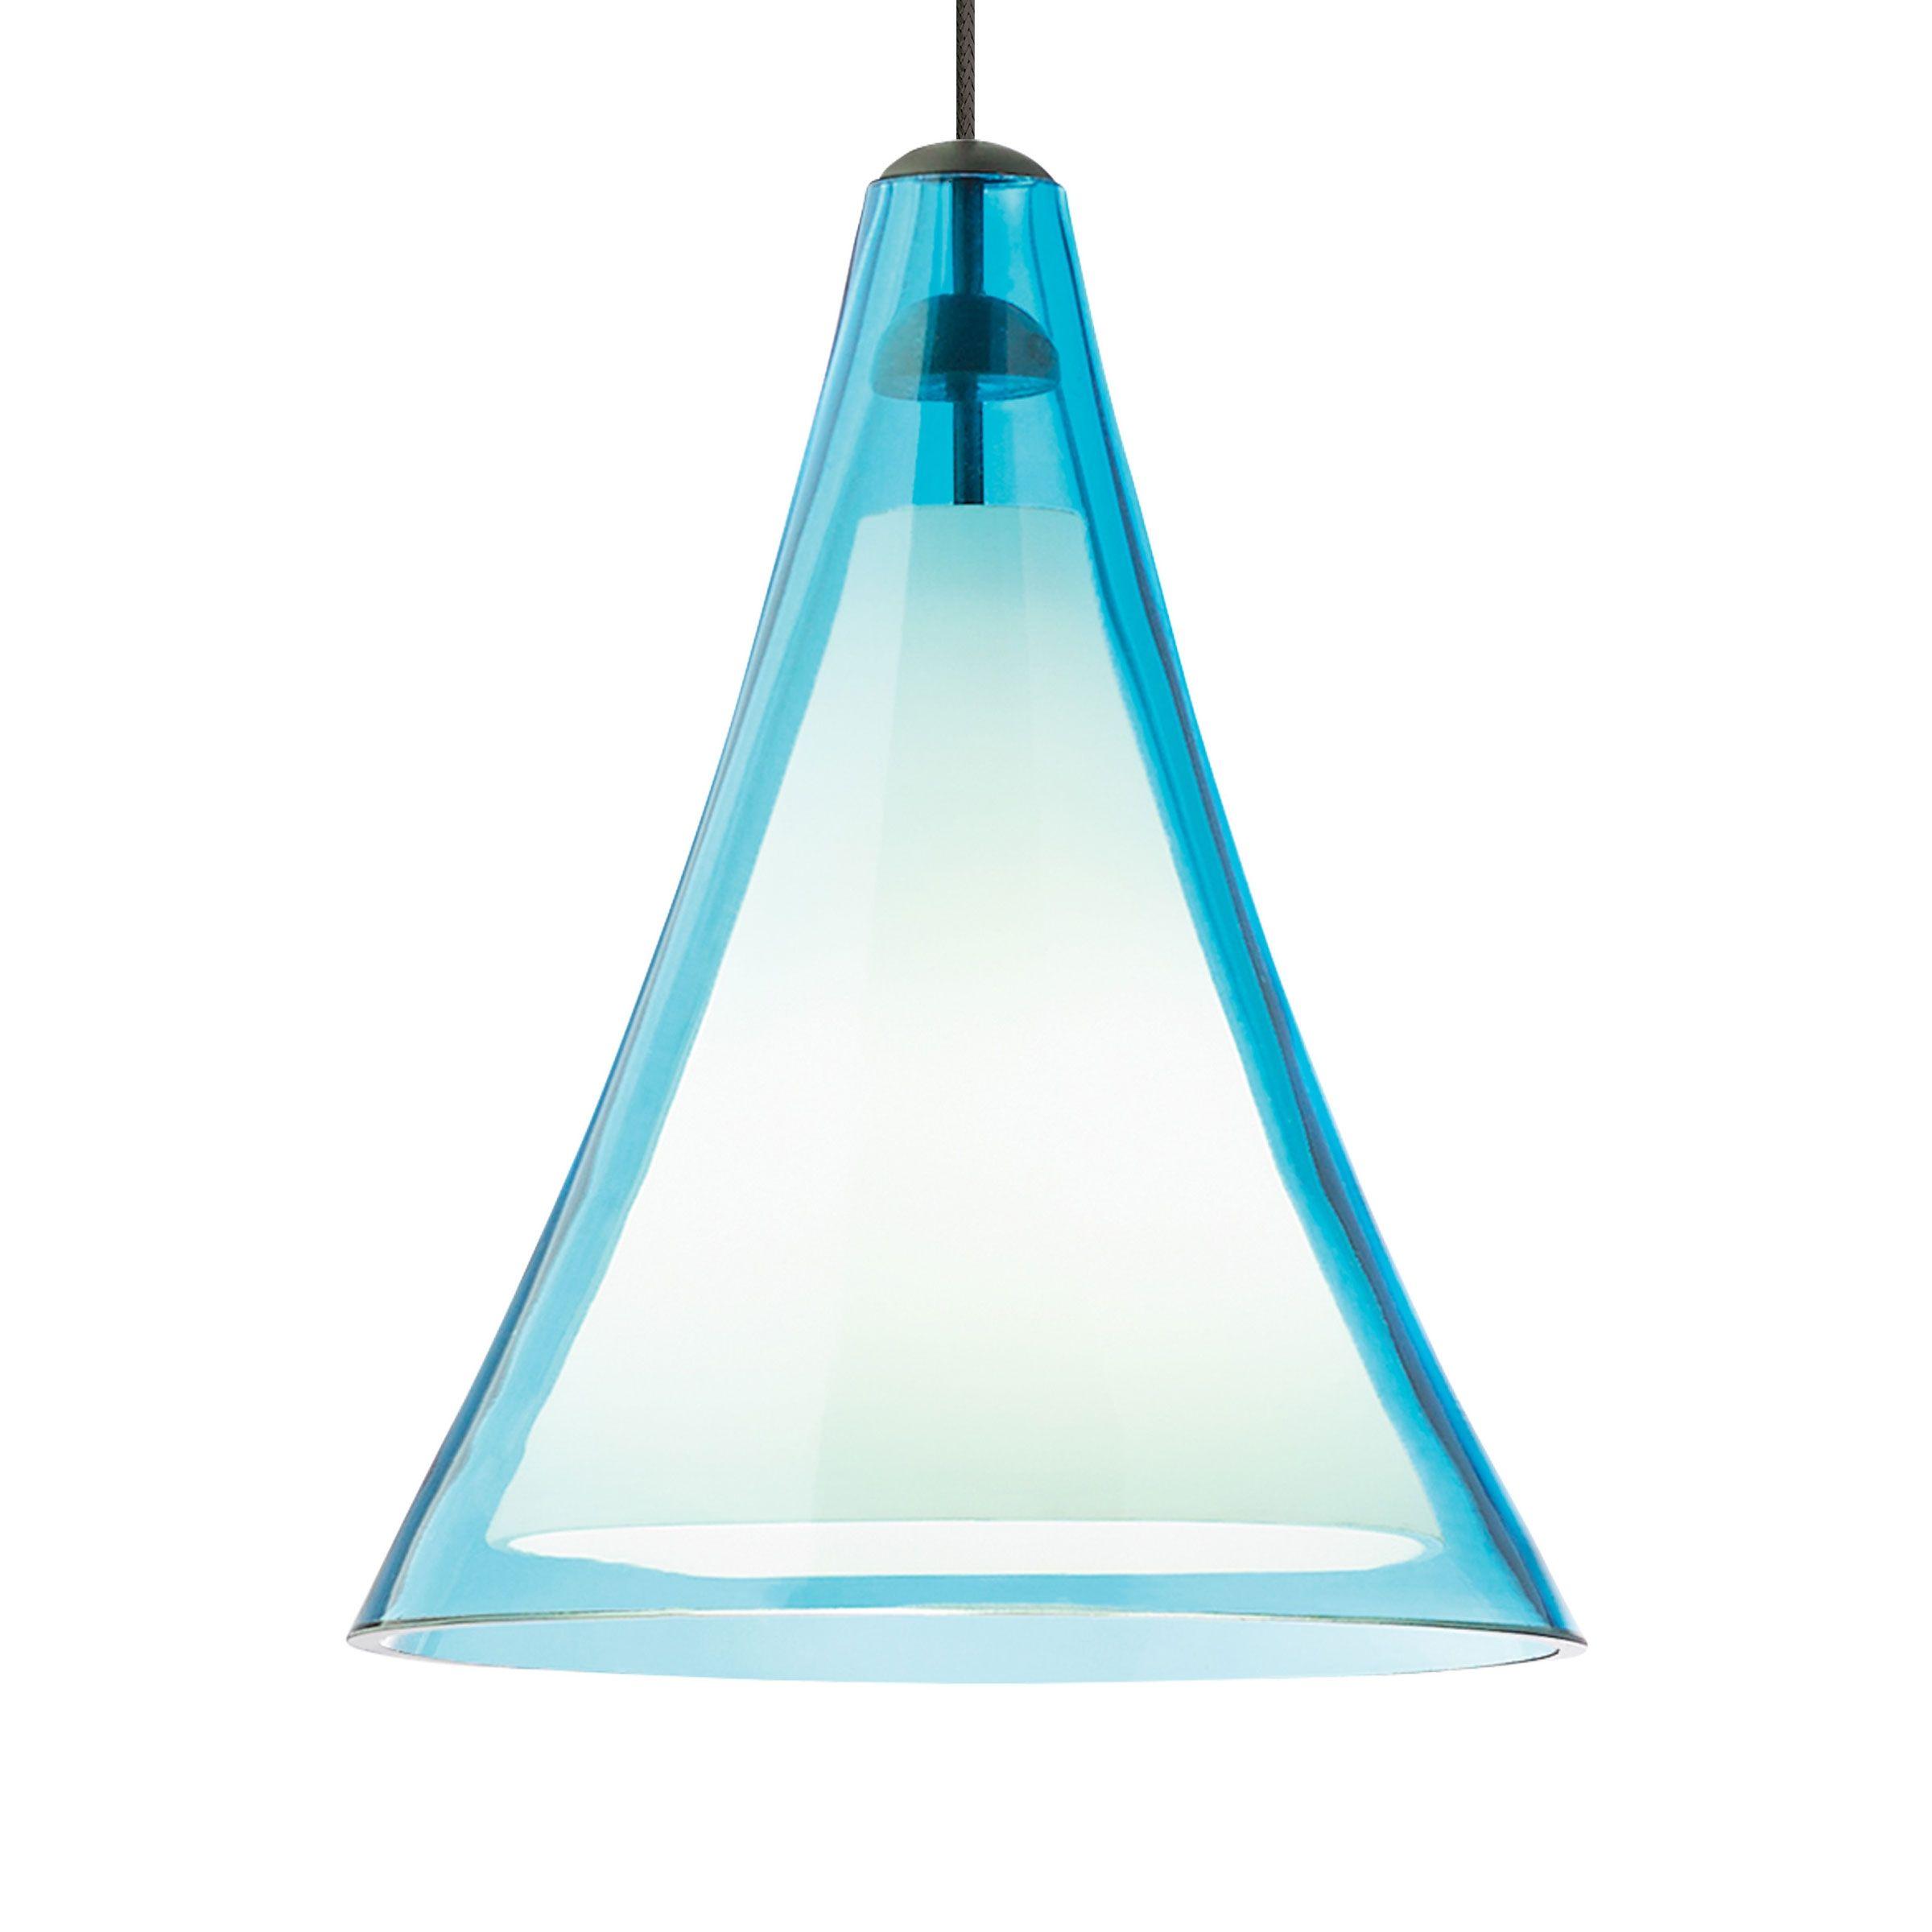 Freejack Mini Melrose II Pendant Tech Lighting at